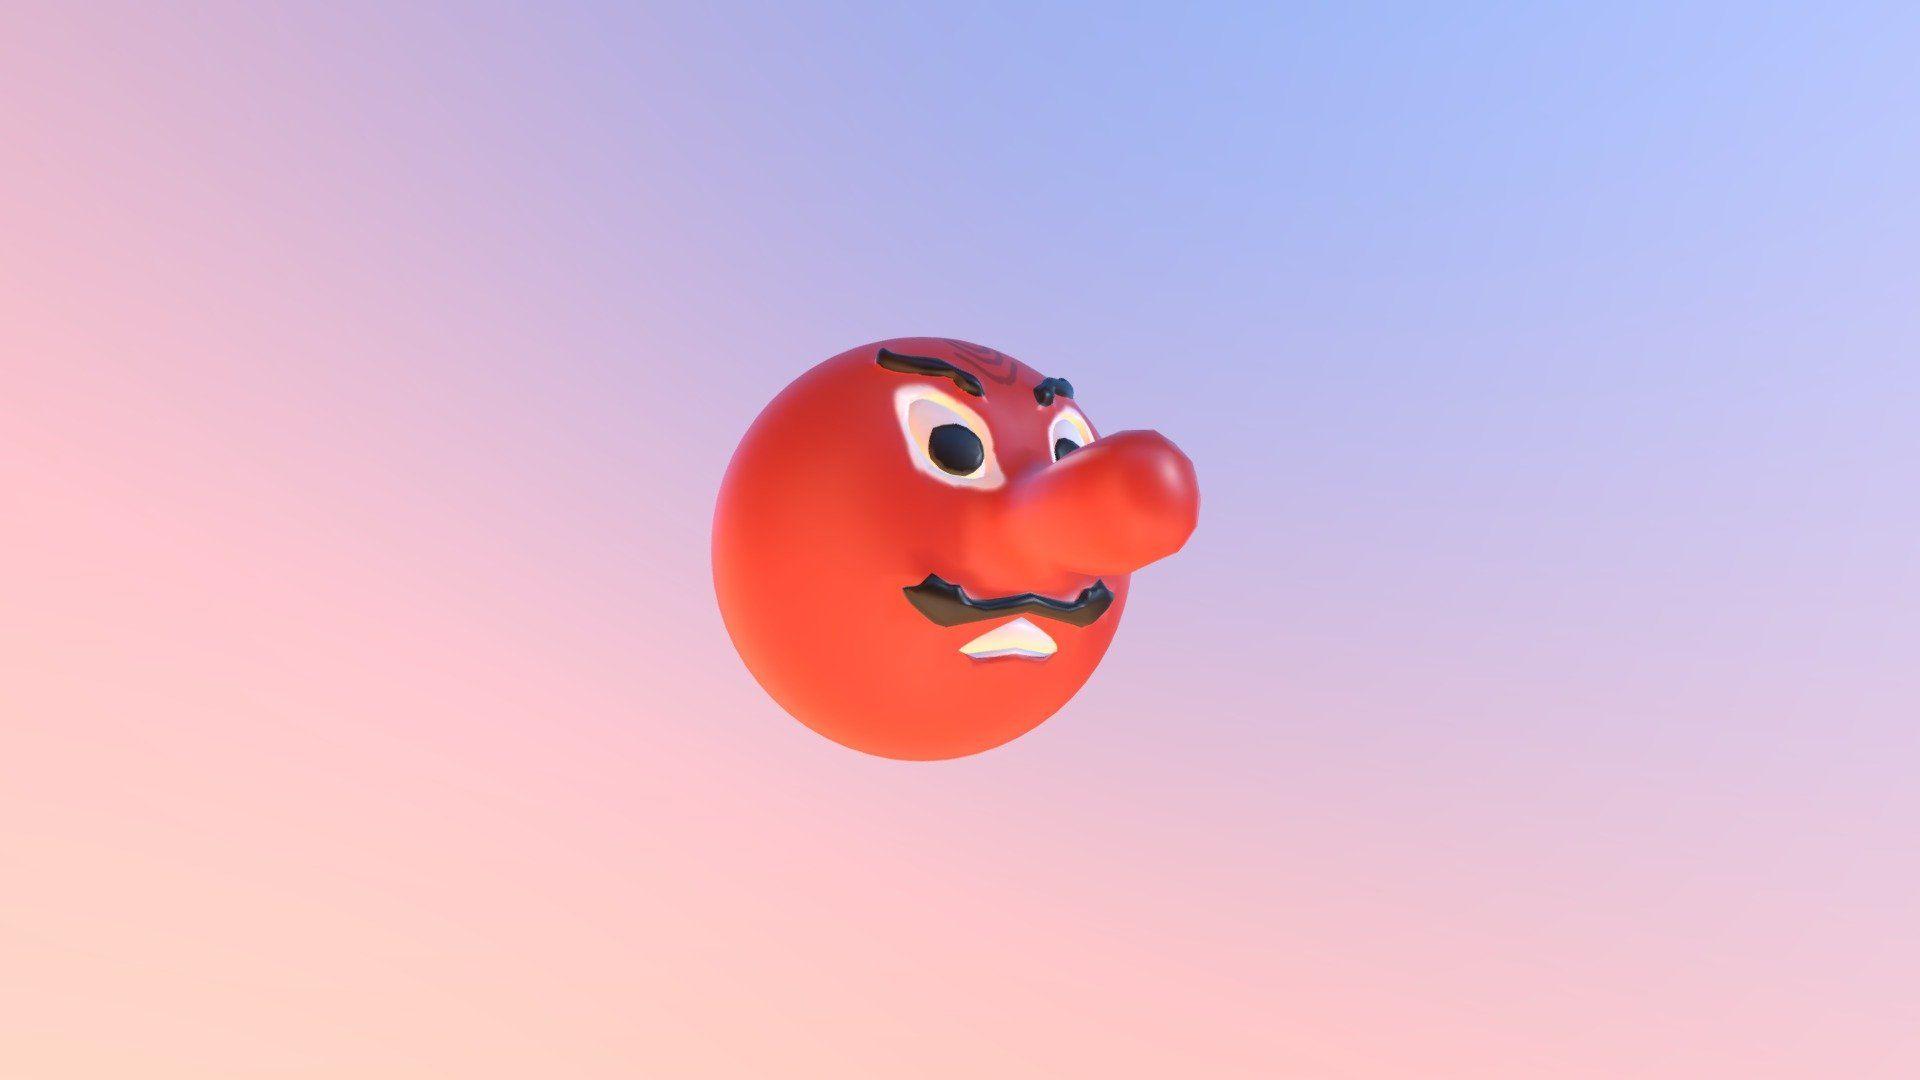 Japanese Goblin Emoji Download Free 3d Model By Saywhoom Saywhoom Fd30495 Ad Affiliate Ad Emoji Goblin Sayw In 2020 Creative Icon Icon Design Goblin